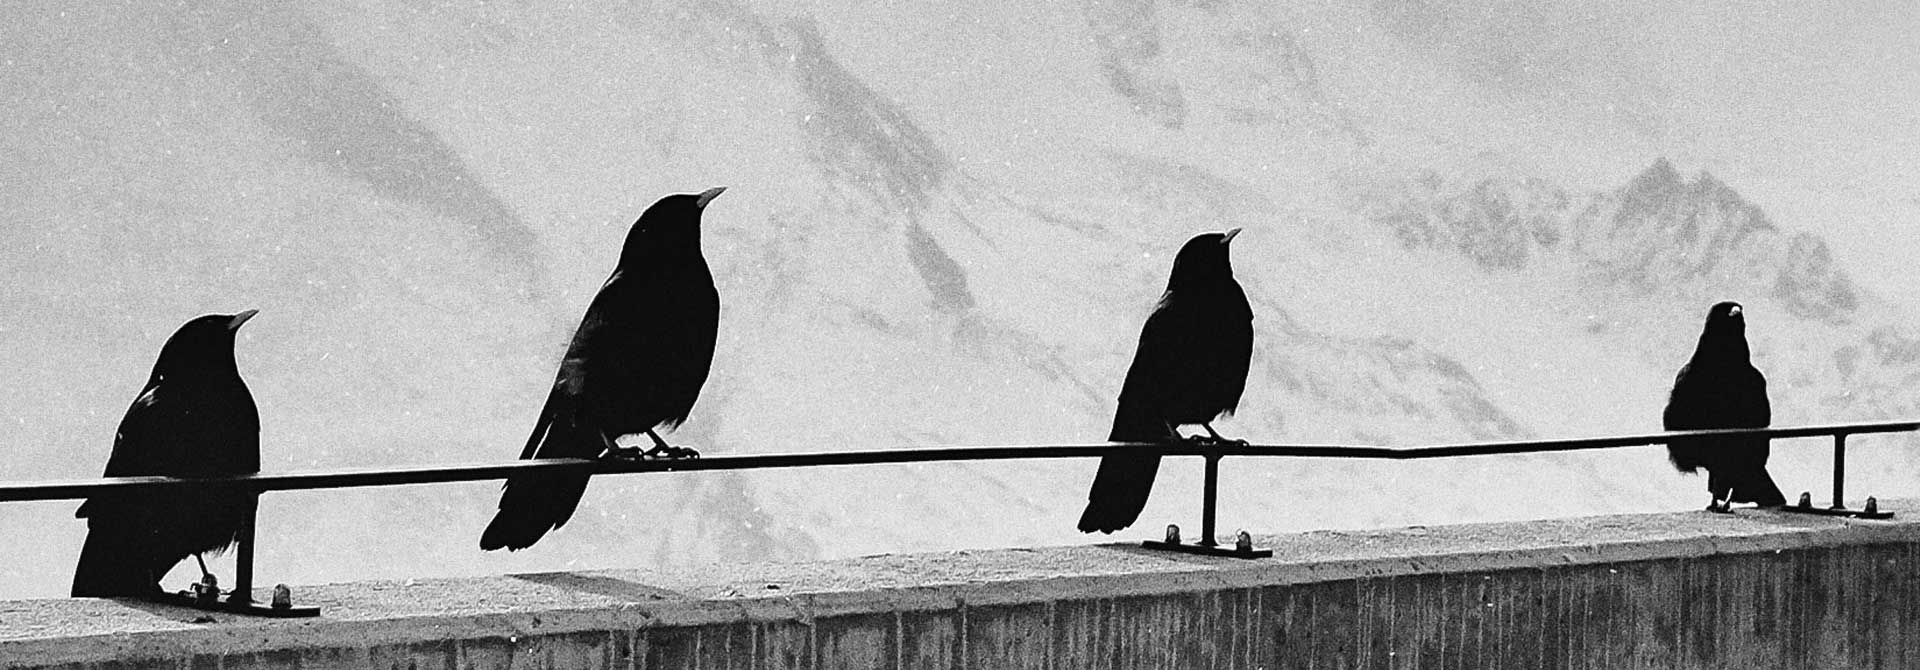 Corvid.Studio - Photo of ravens on fence by Samuel Zeller - Unsplash image